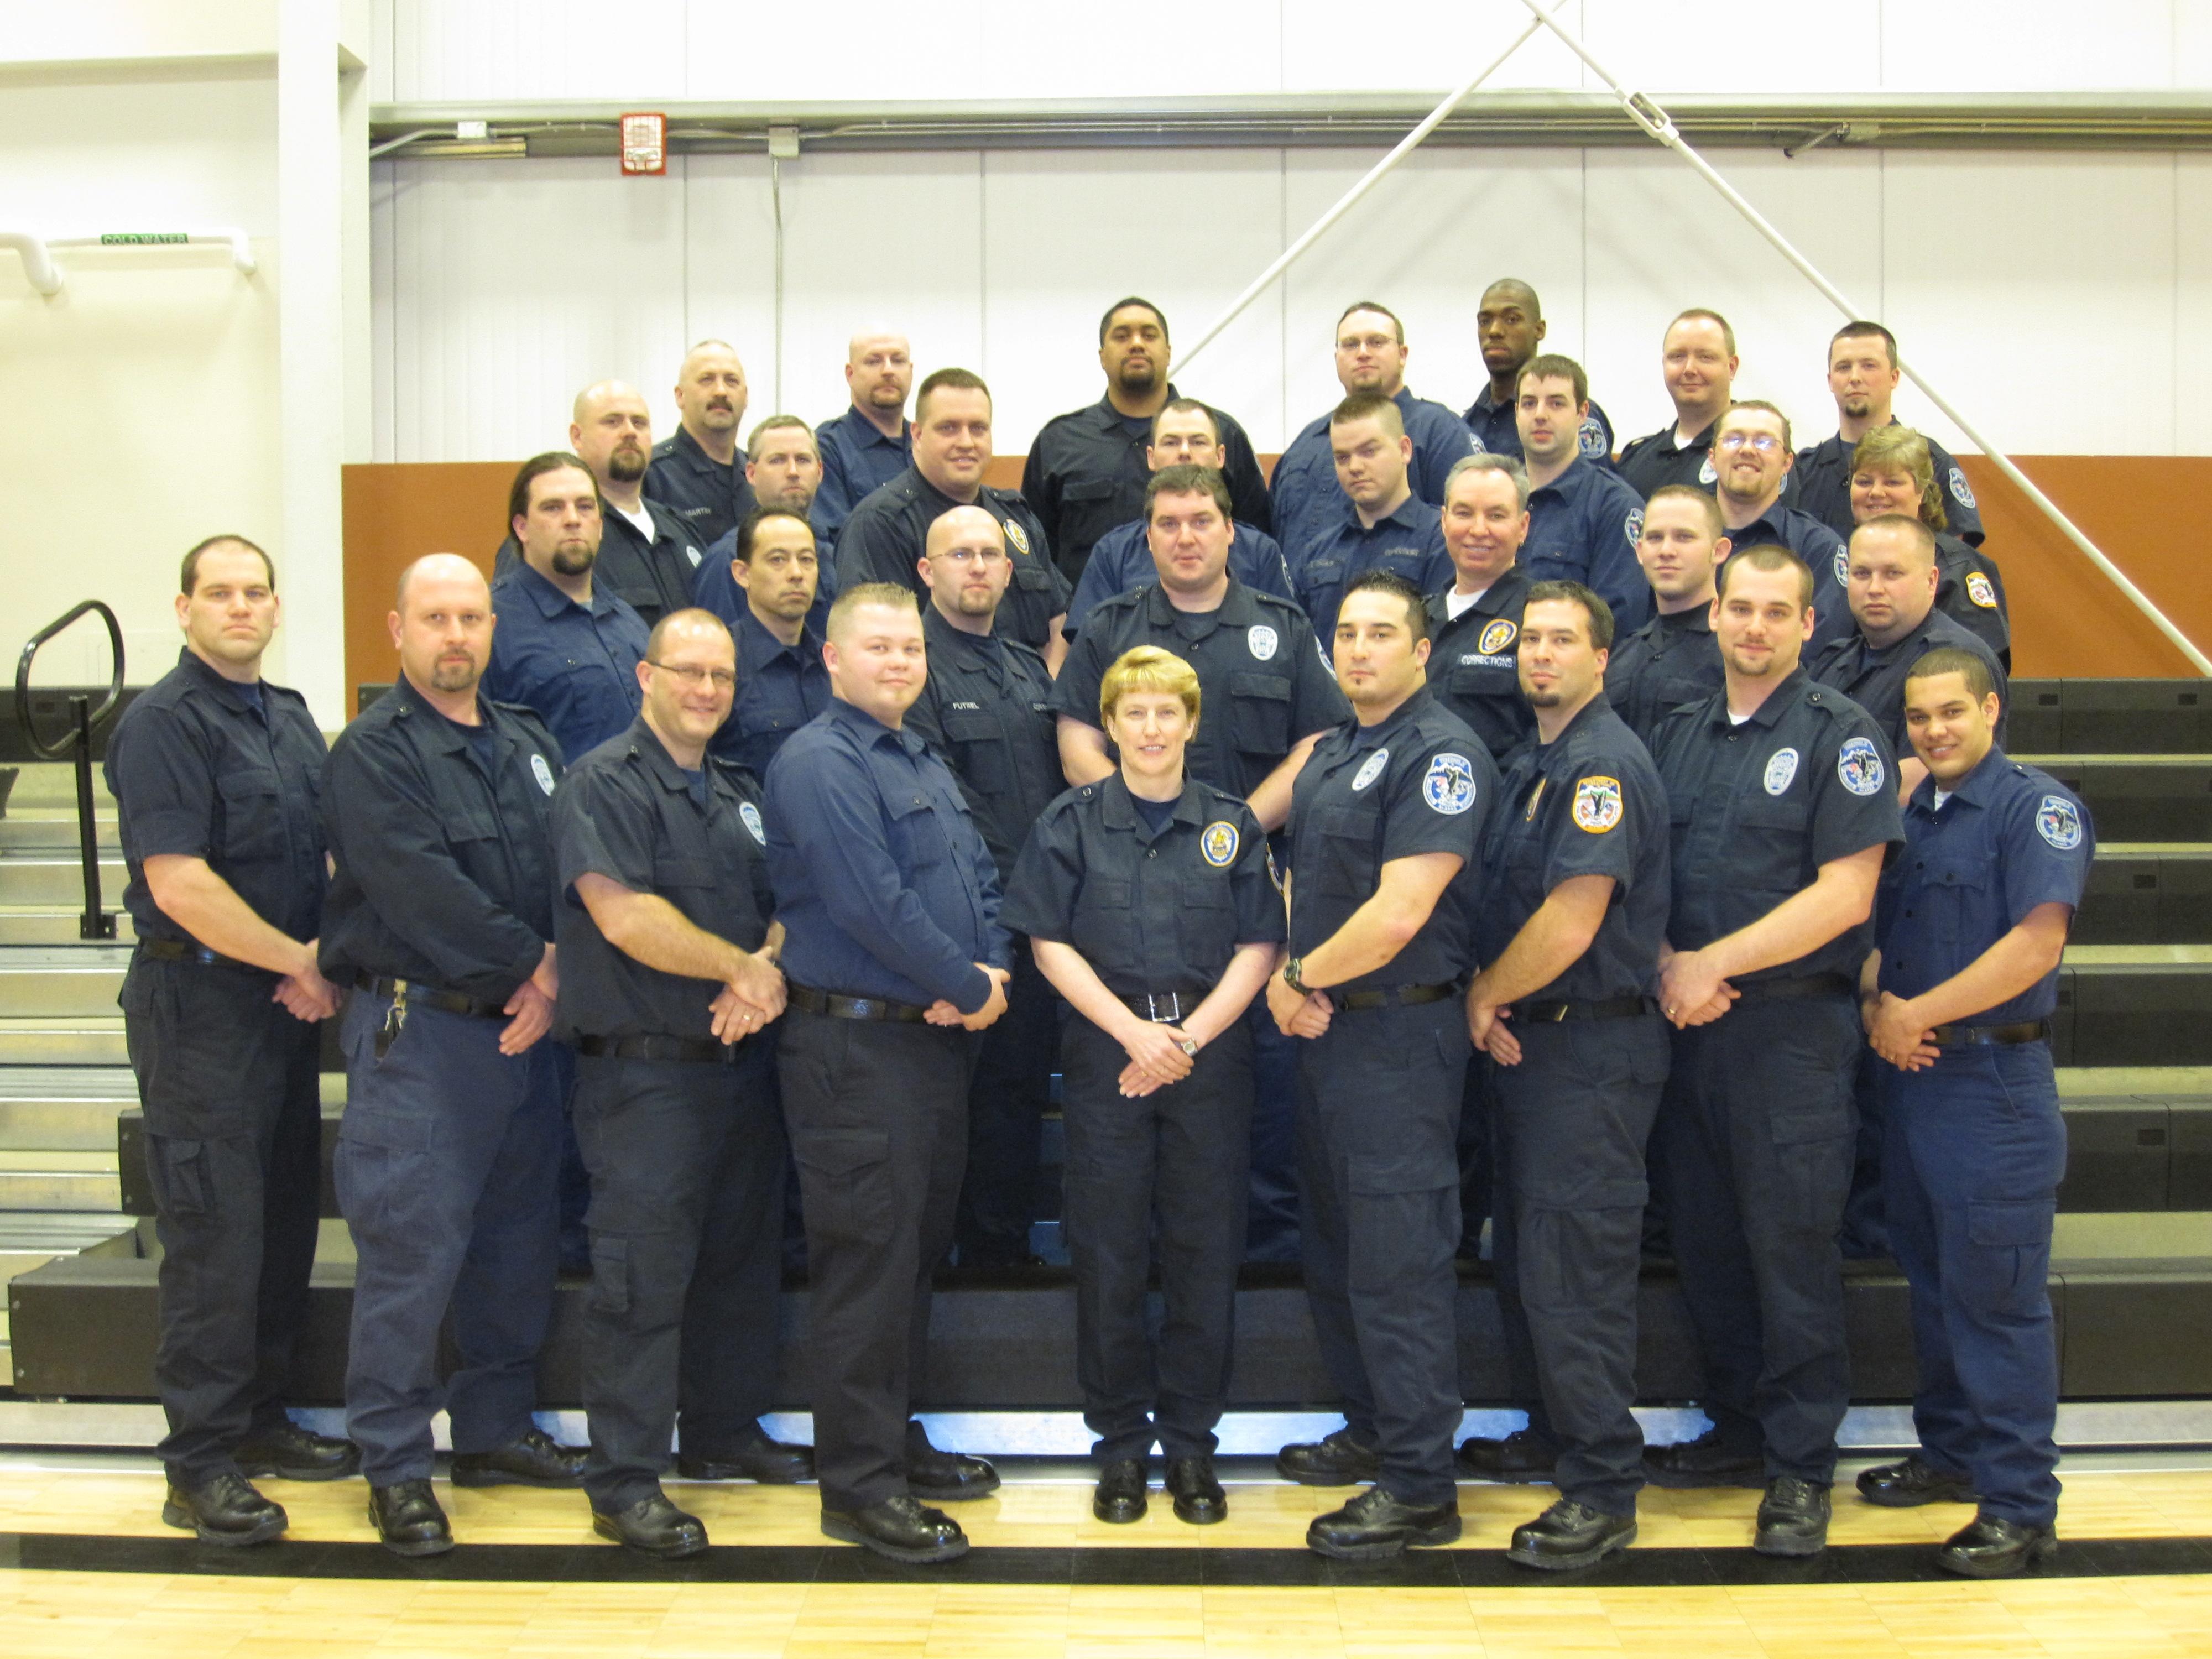 correctional correctional officer graduations training academy alaska 4000x3000